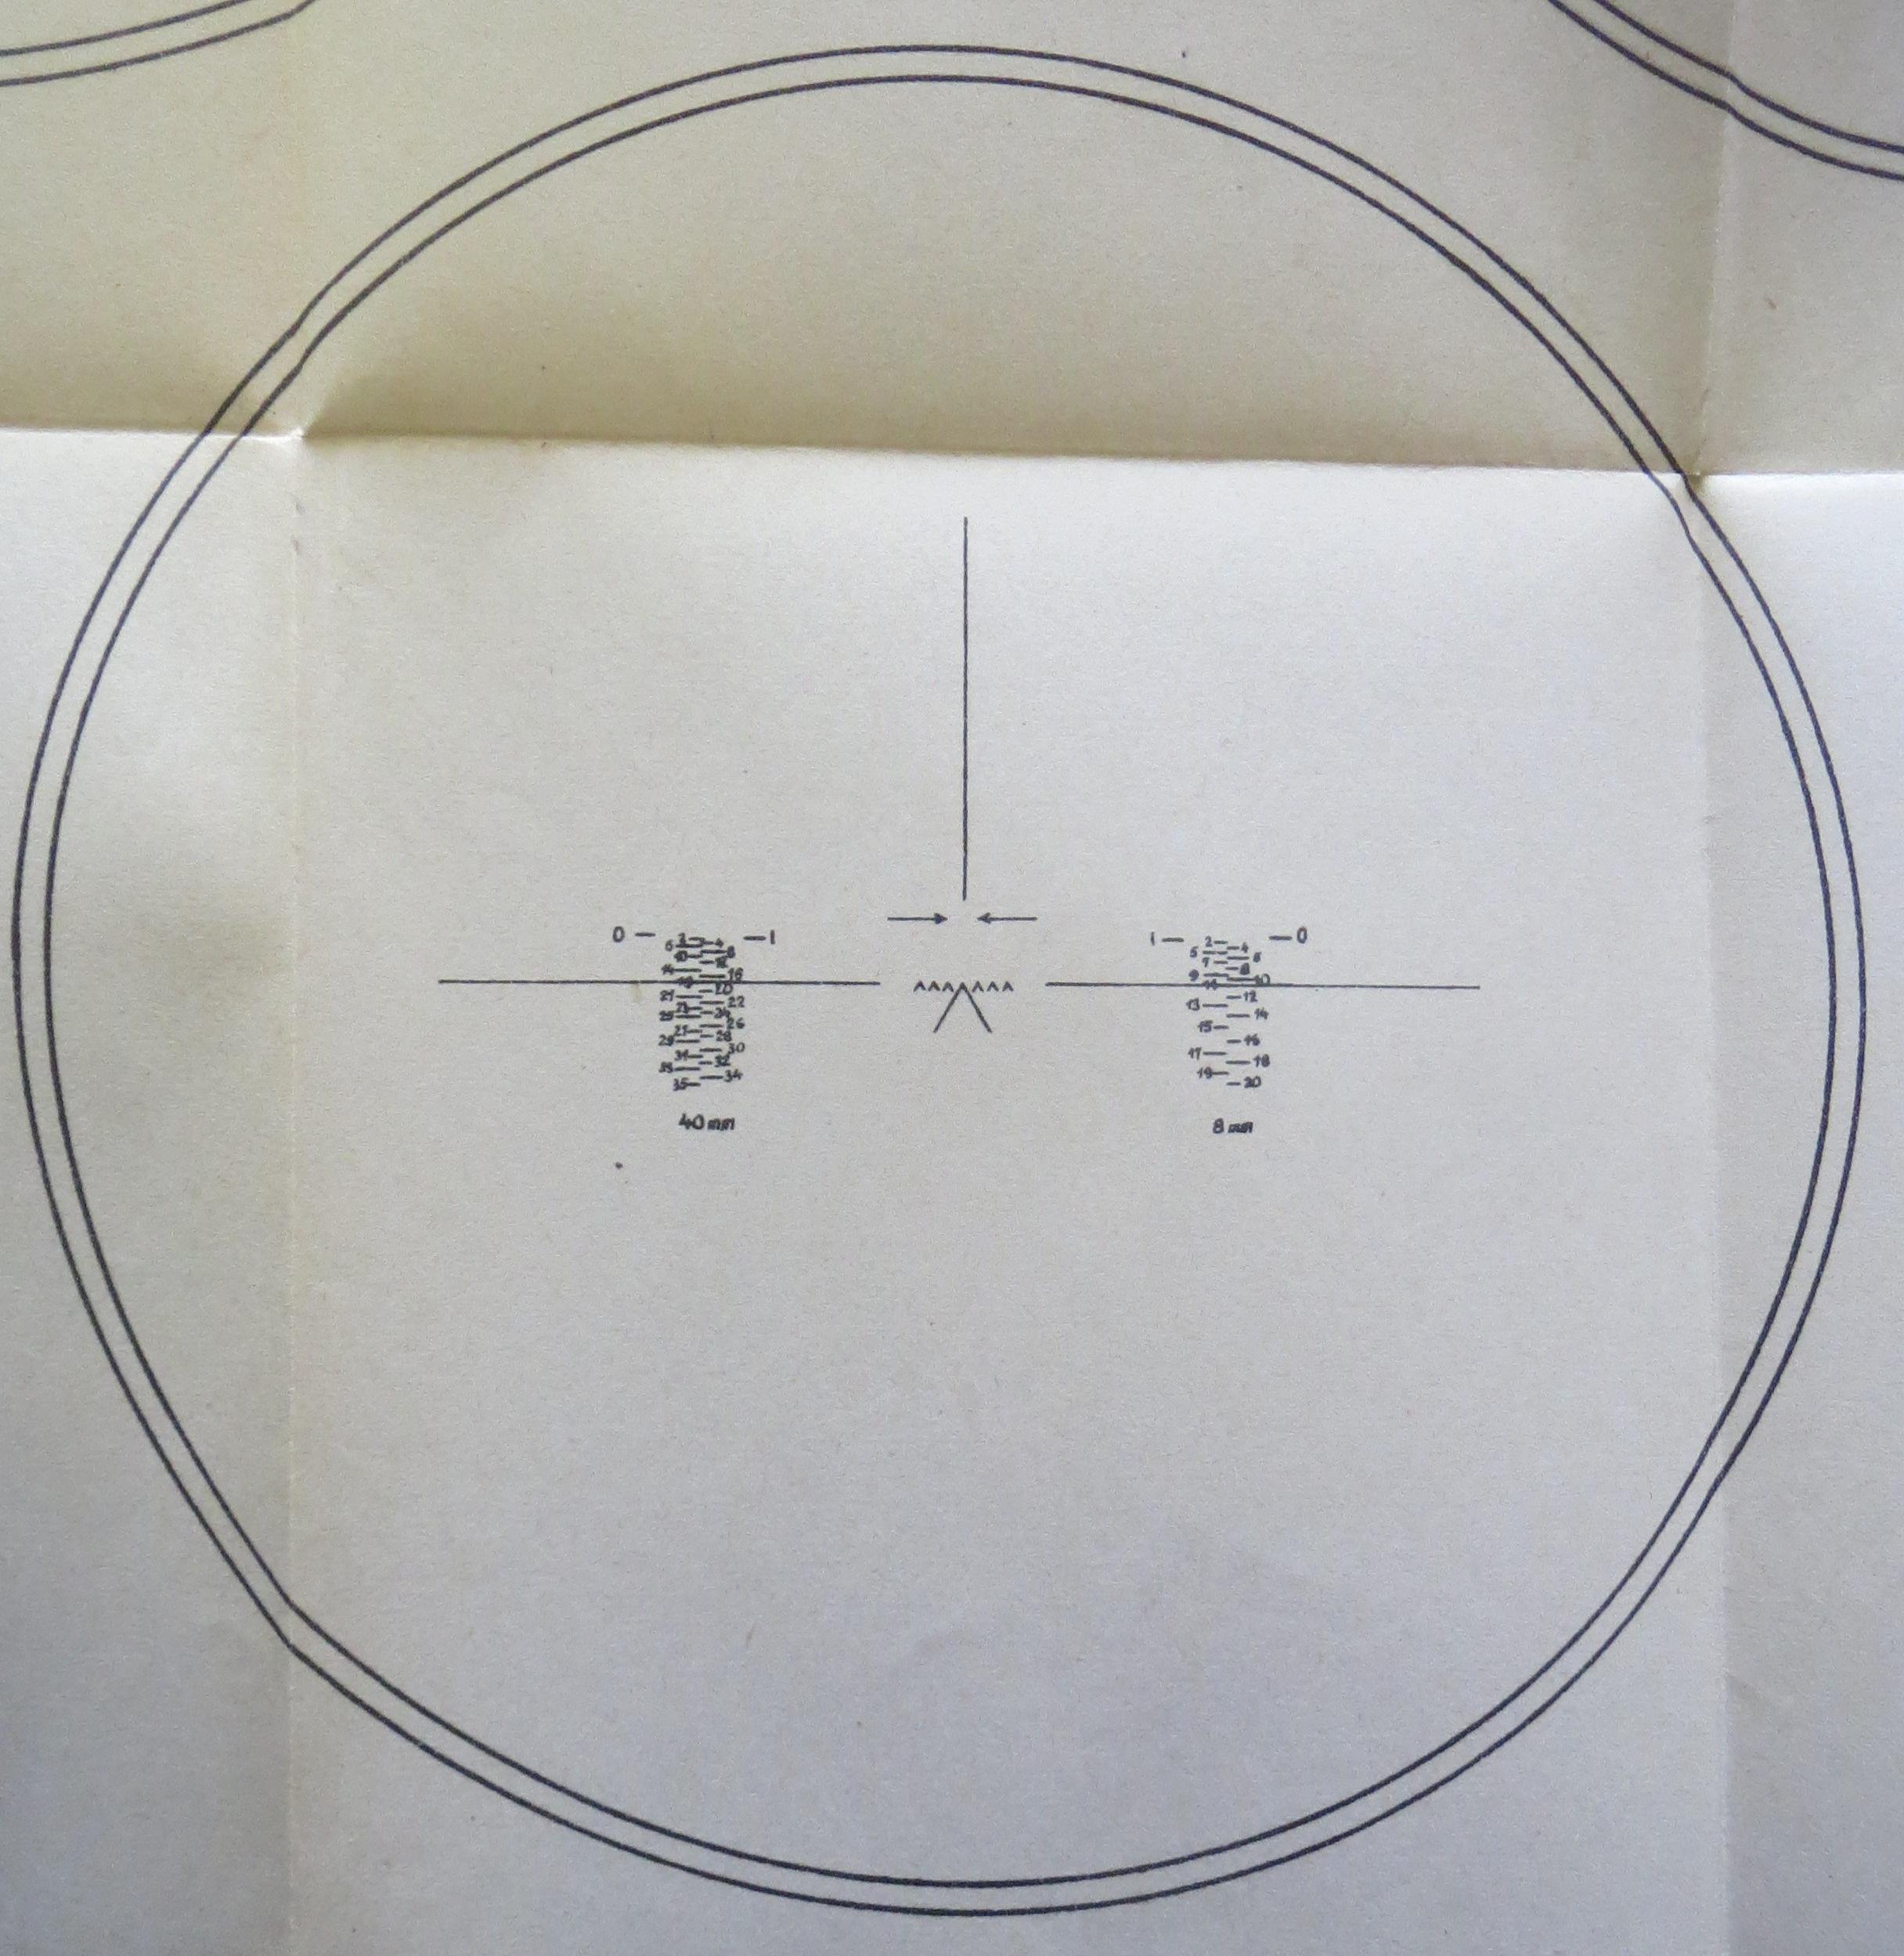 40mm.JPG